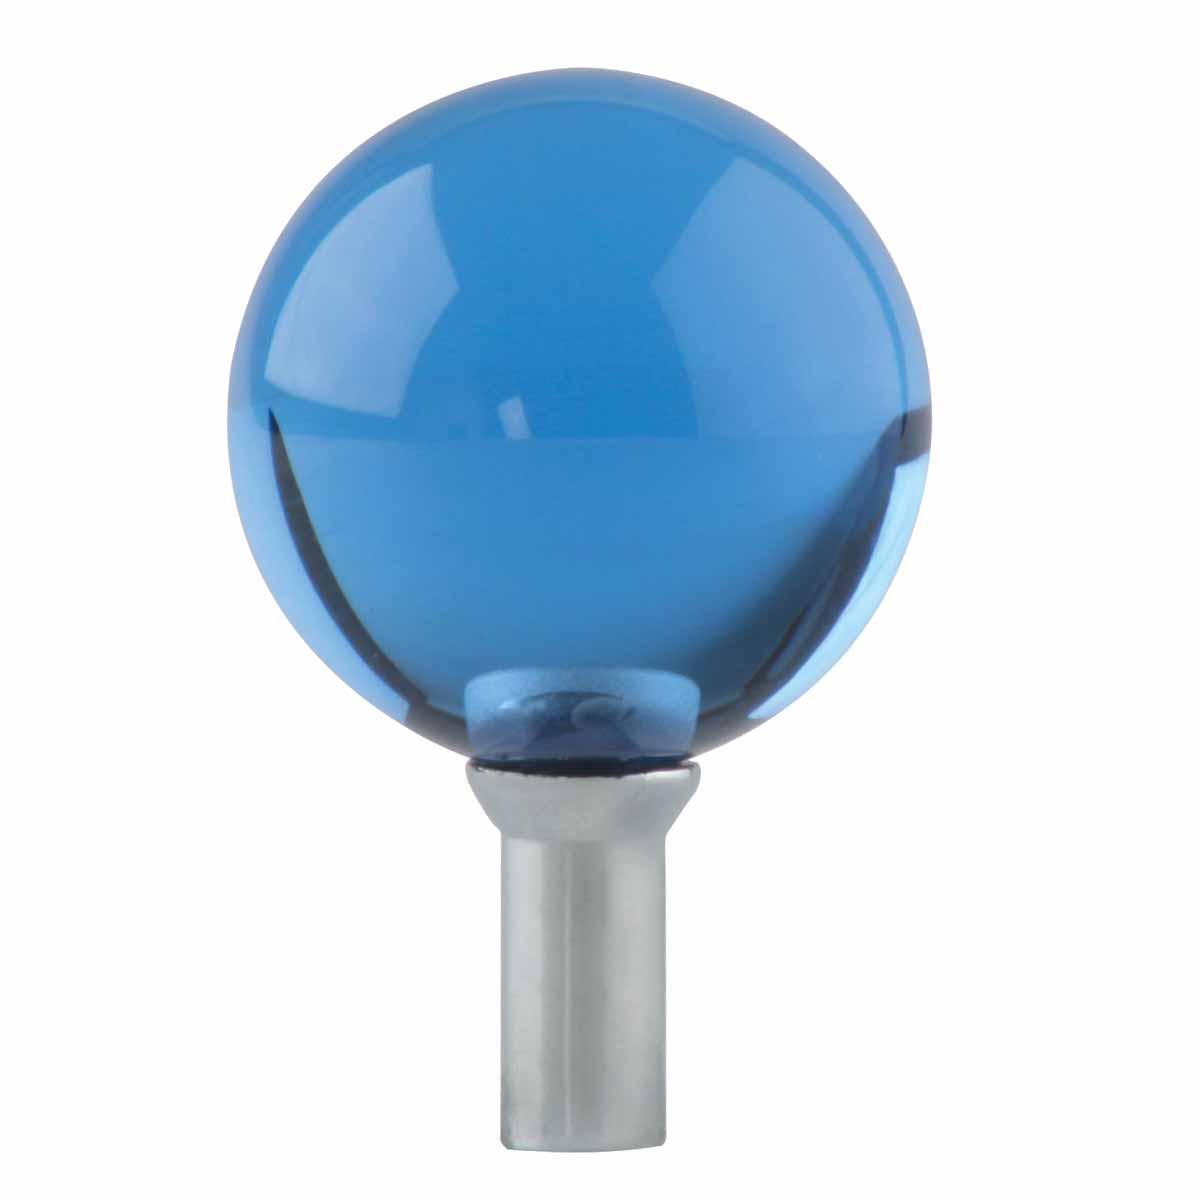 Bathroom faucet part blue glass ball knob lever handle